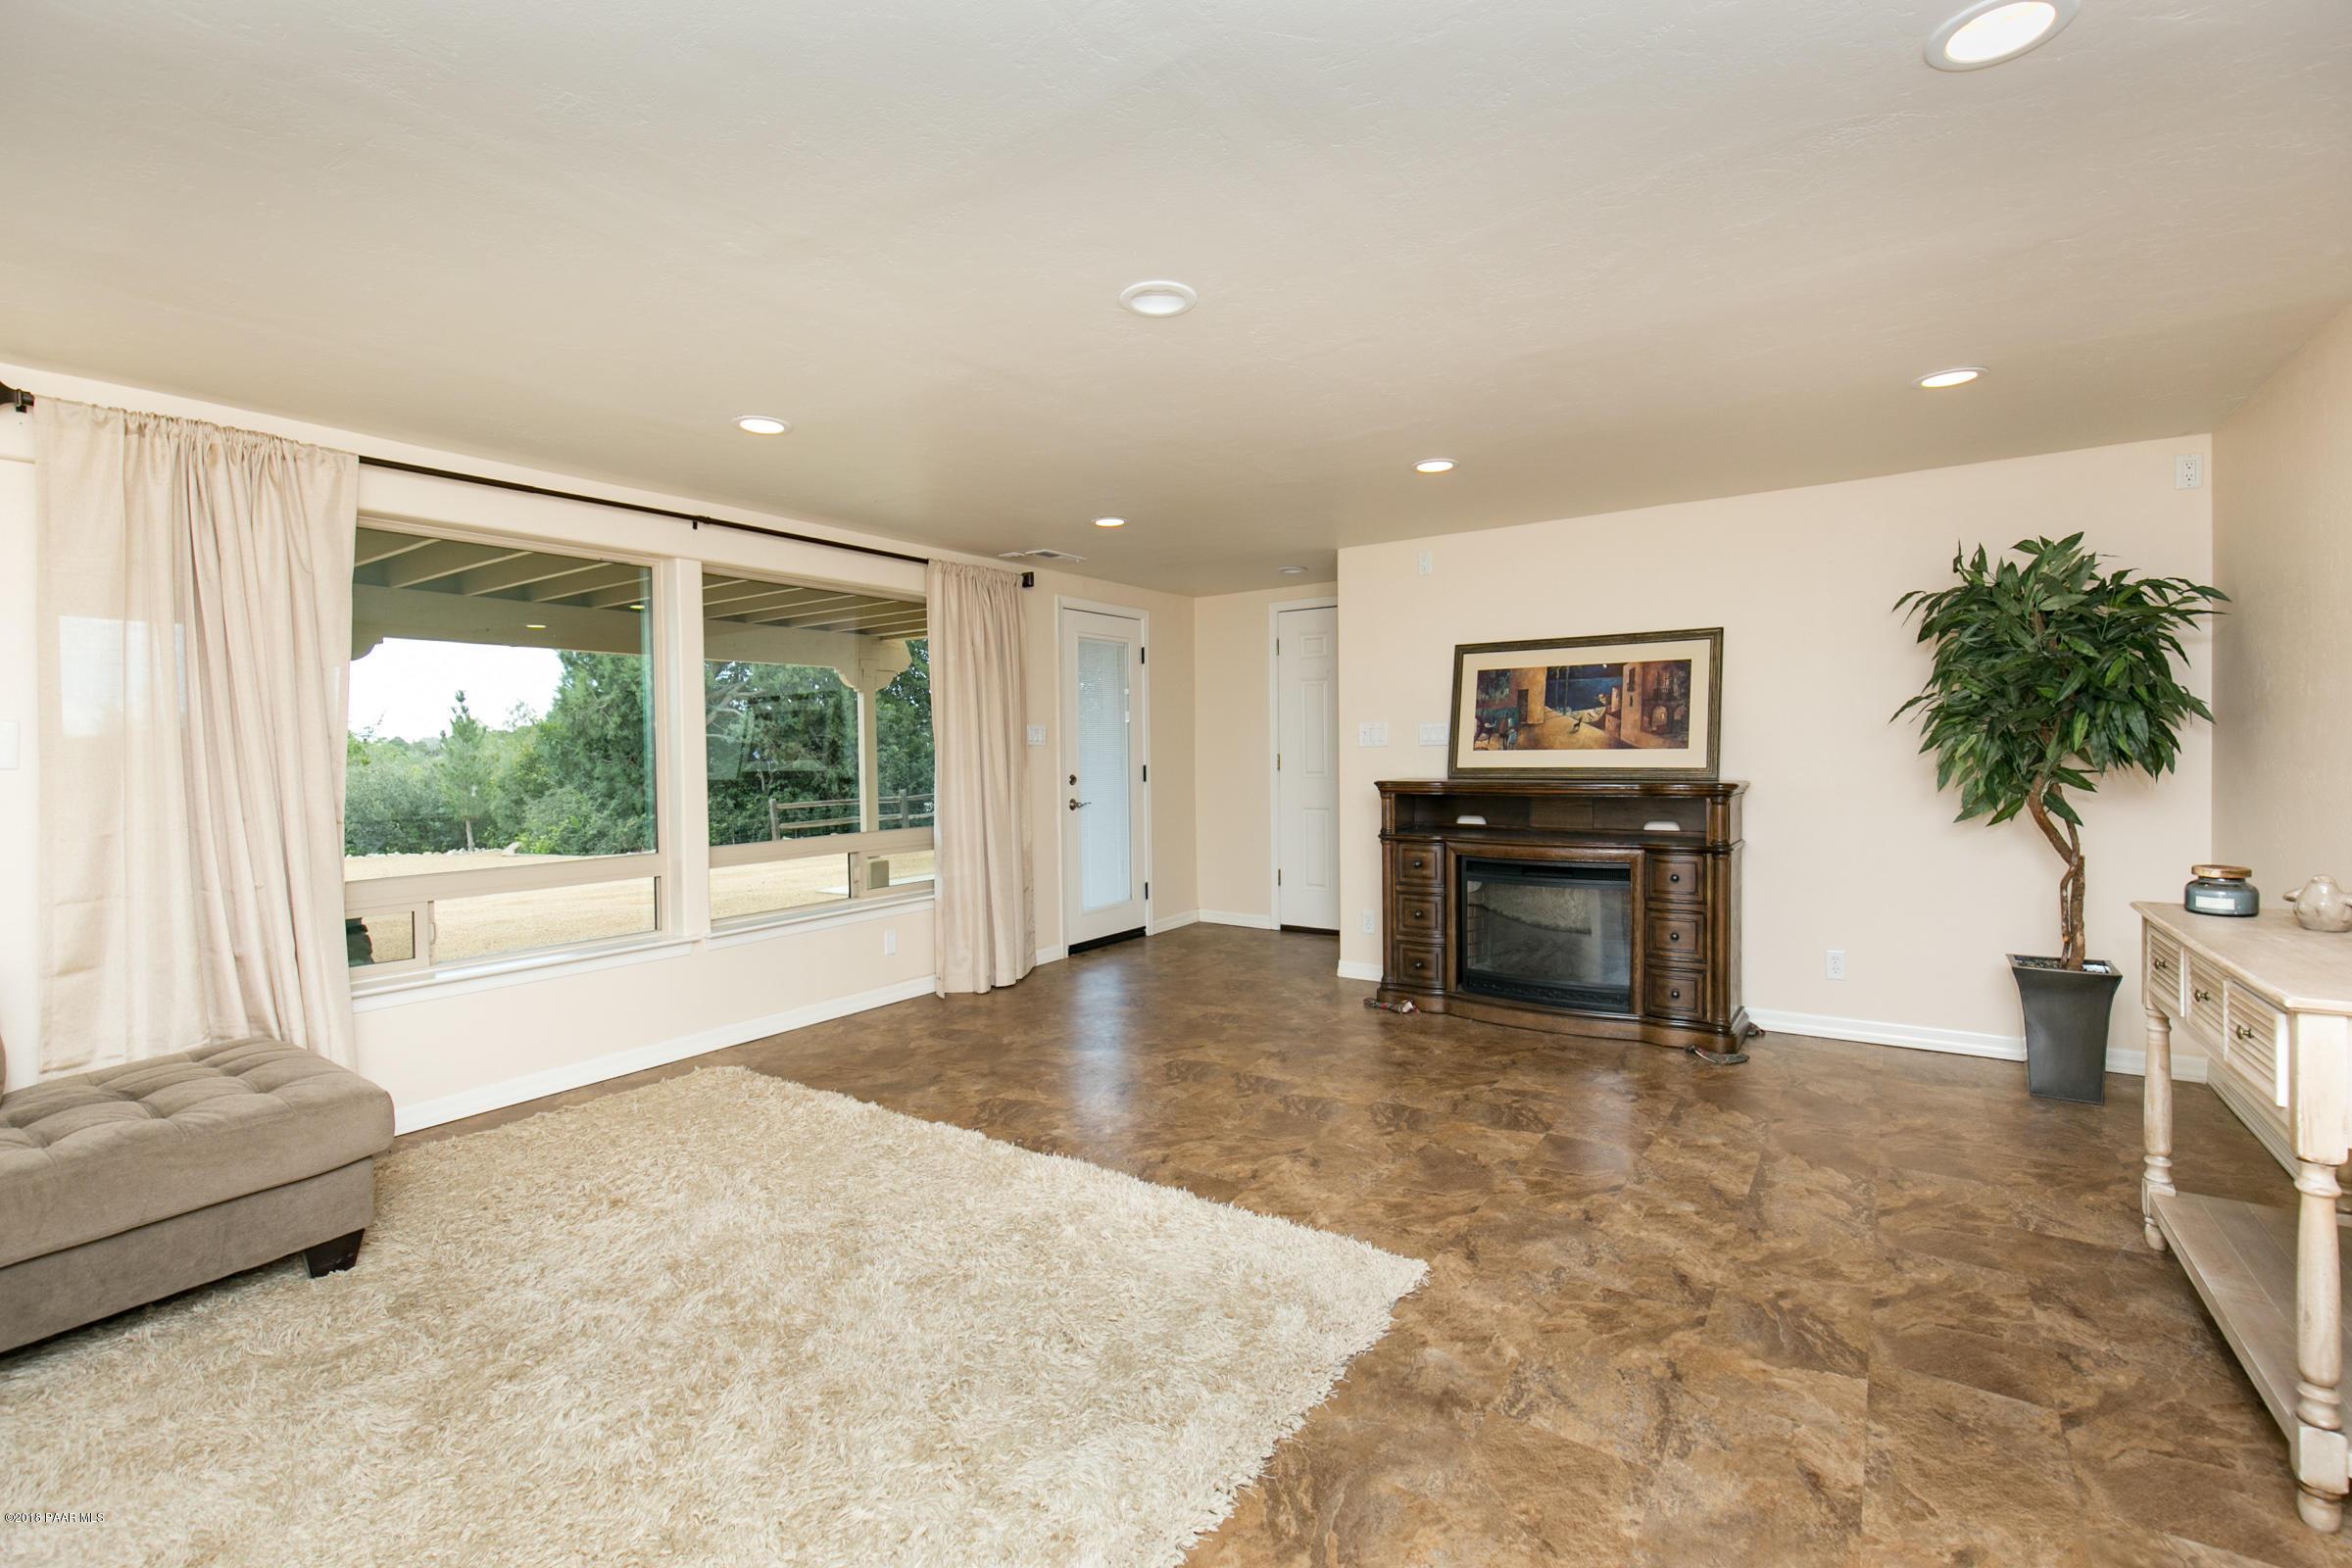 390 W Delano Avenue Prescott, AZ 86301 - MLS #: 1015241